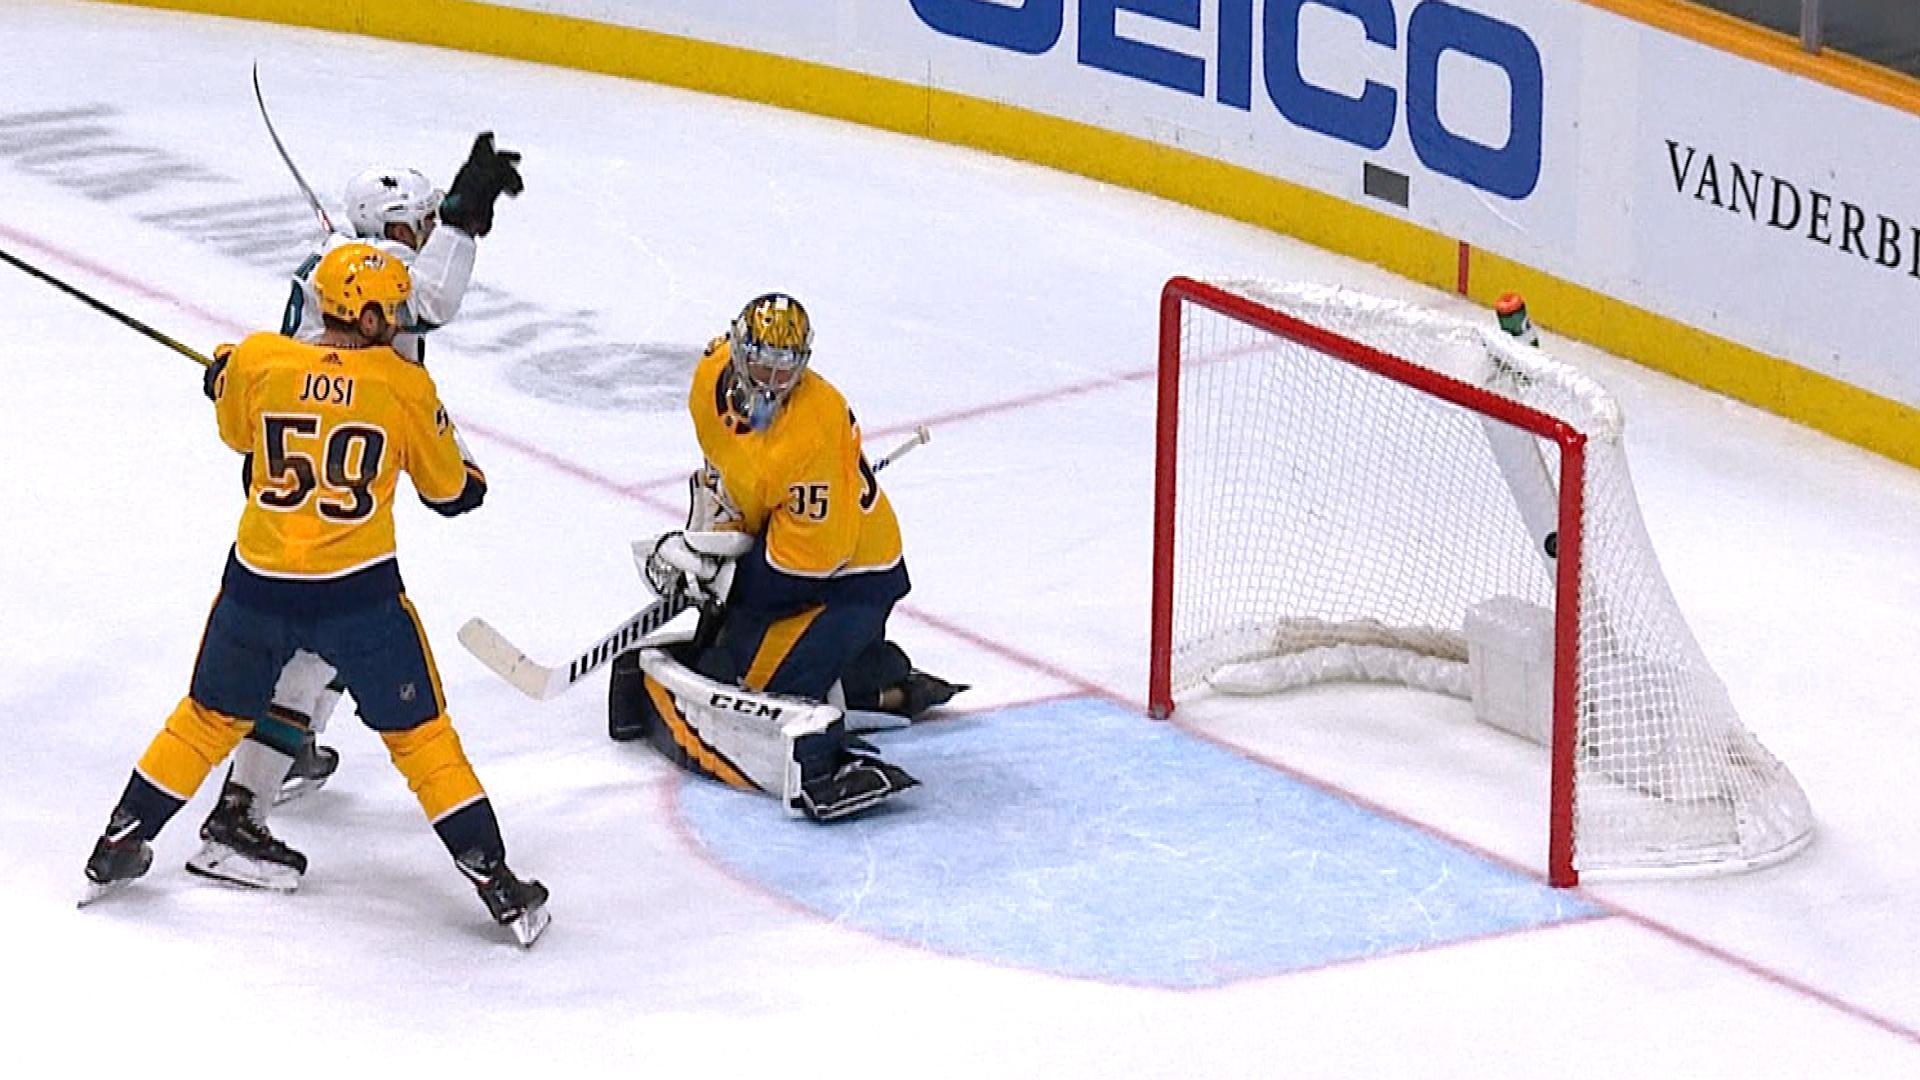 Sharks' Evander Kane tips in goal to halve Predators' lead